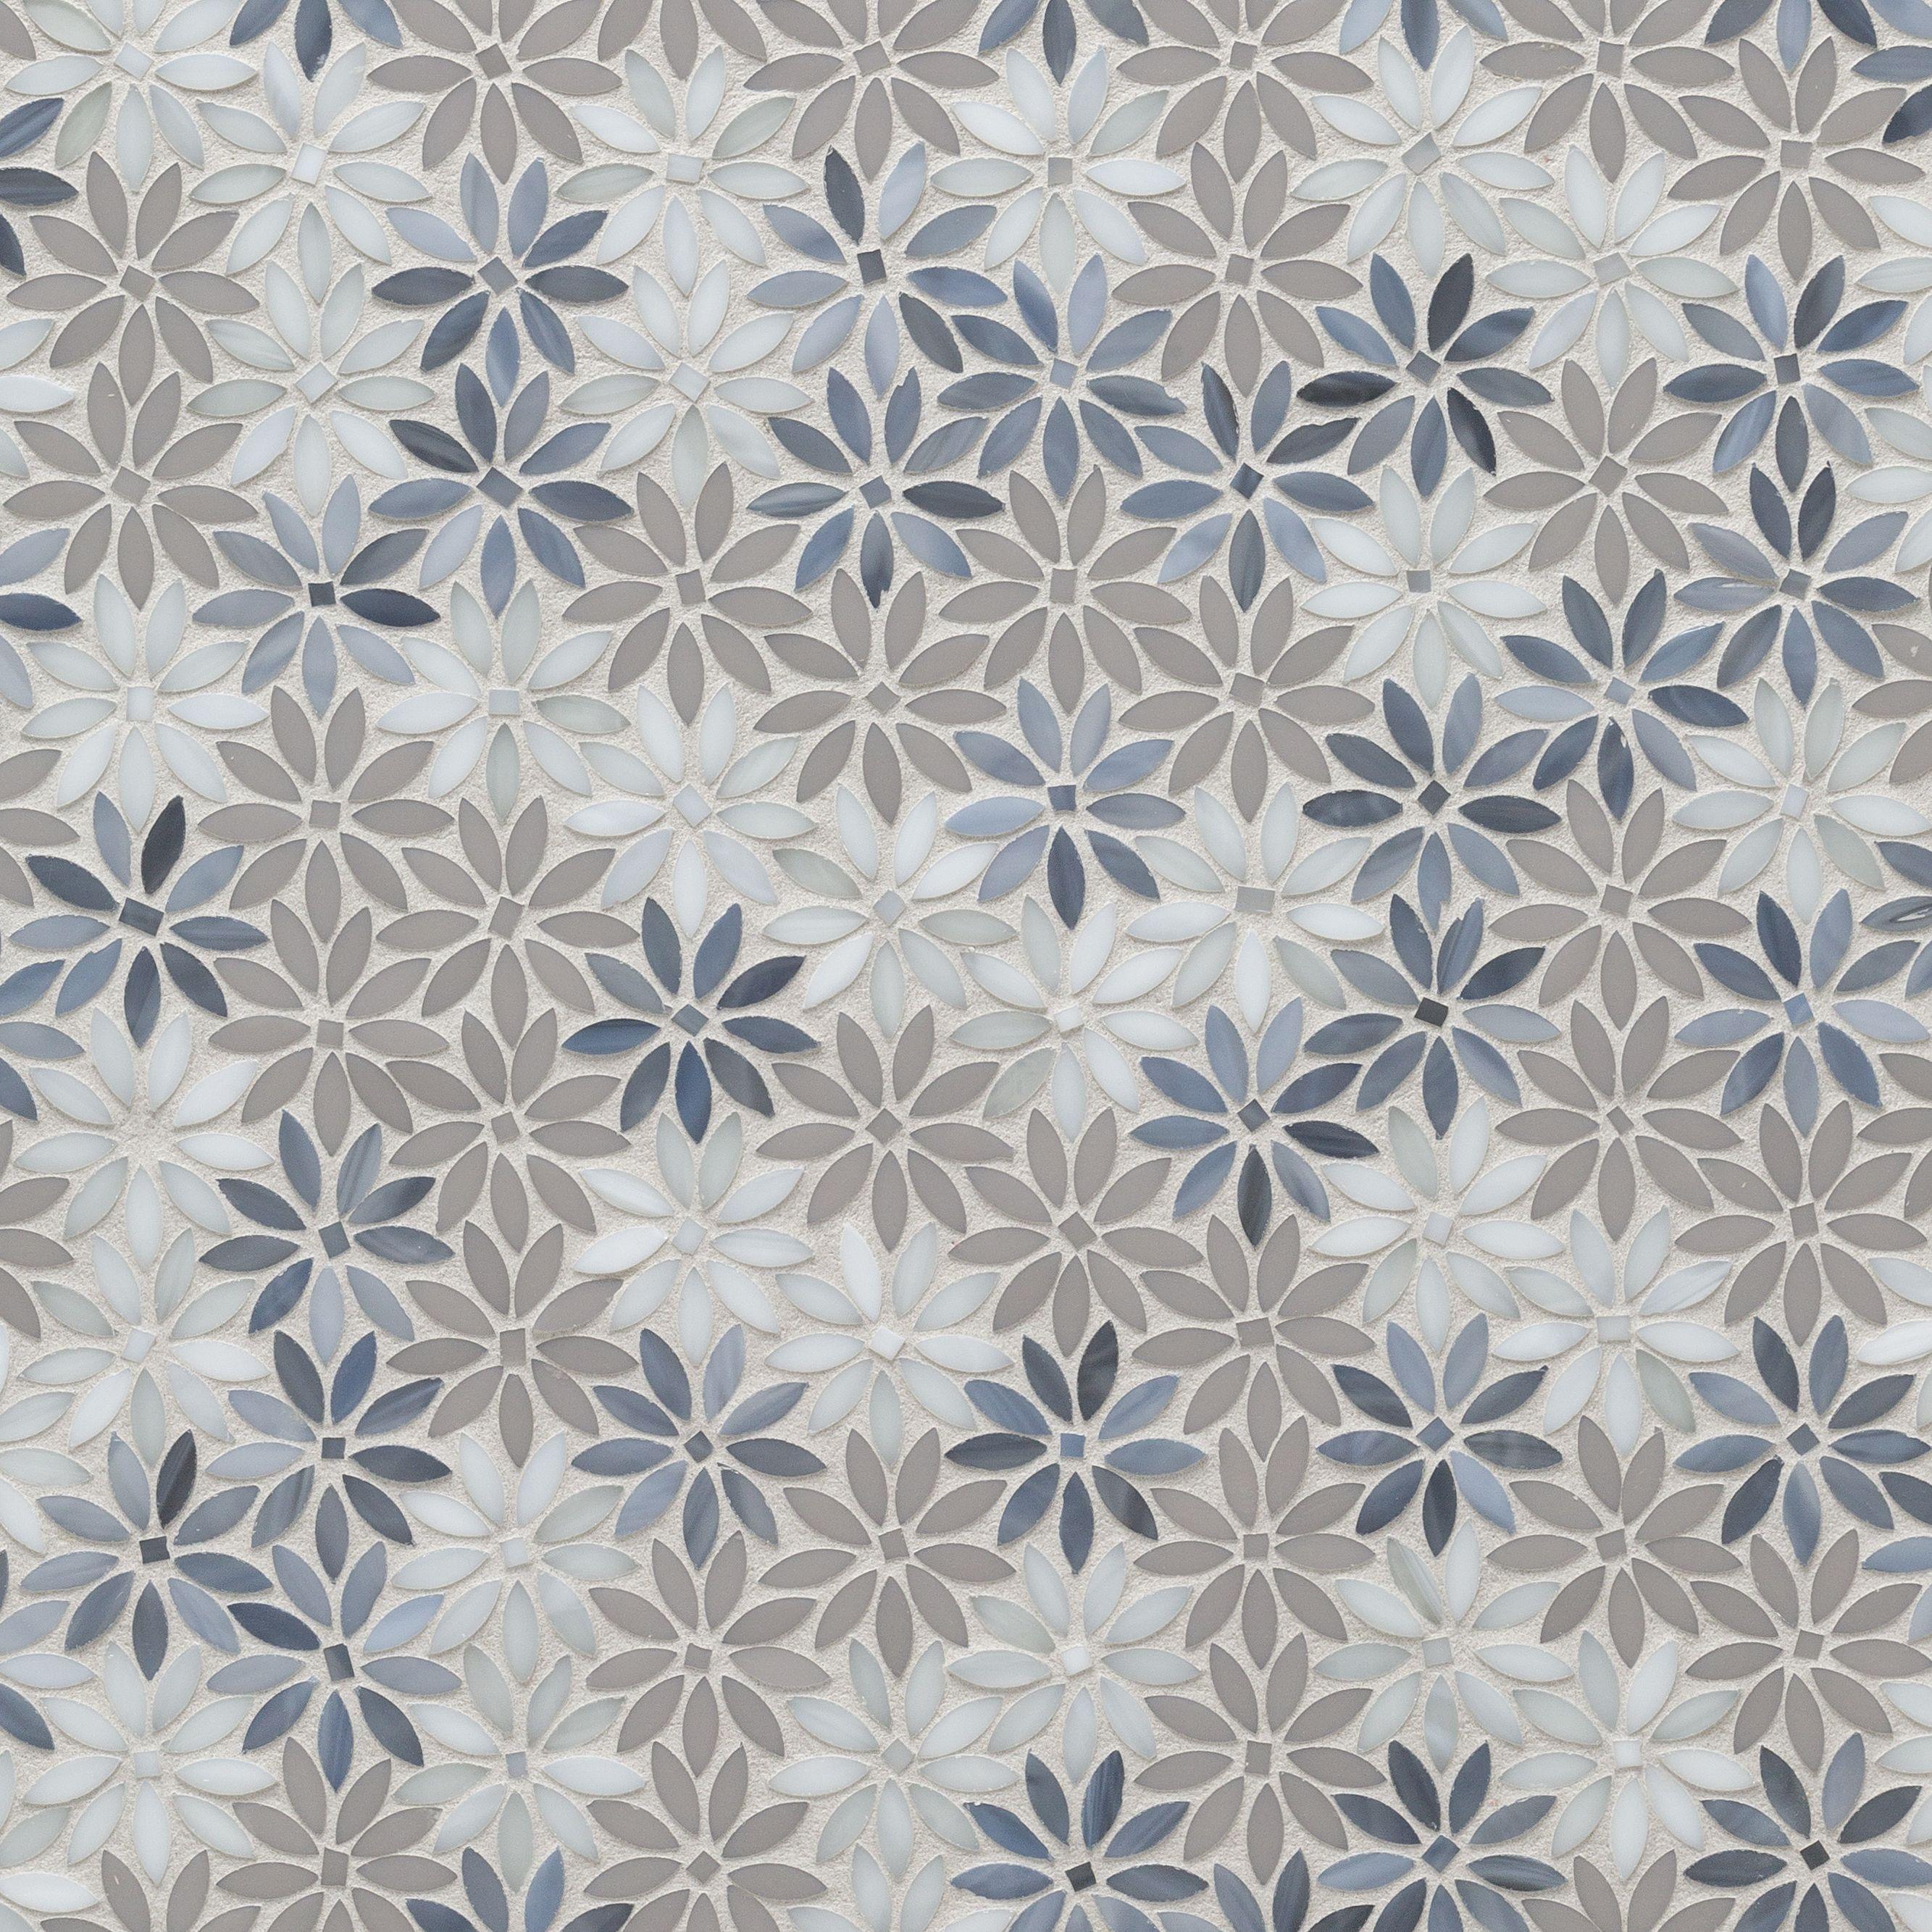 Artistic Tile Der Daisy Grey Beige